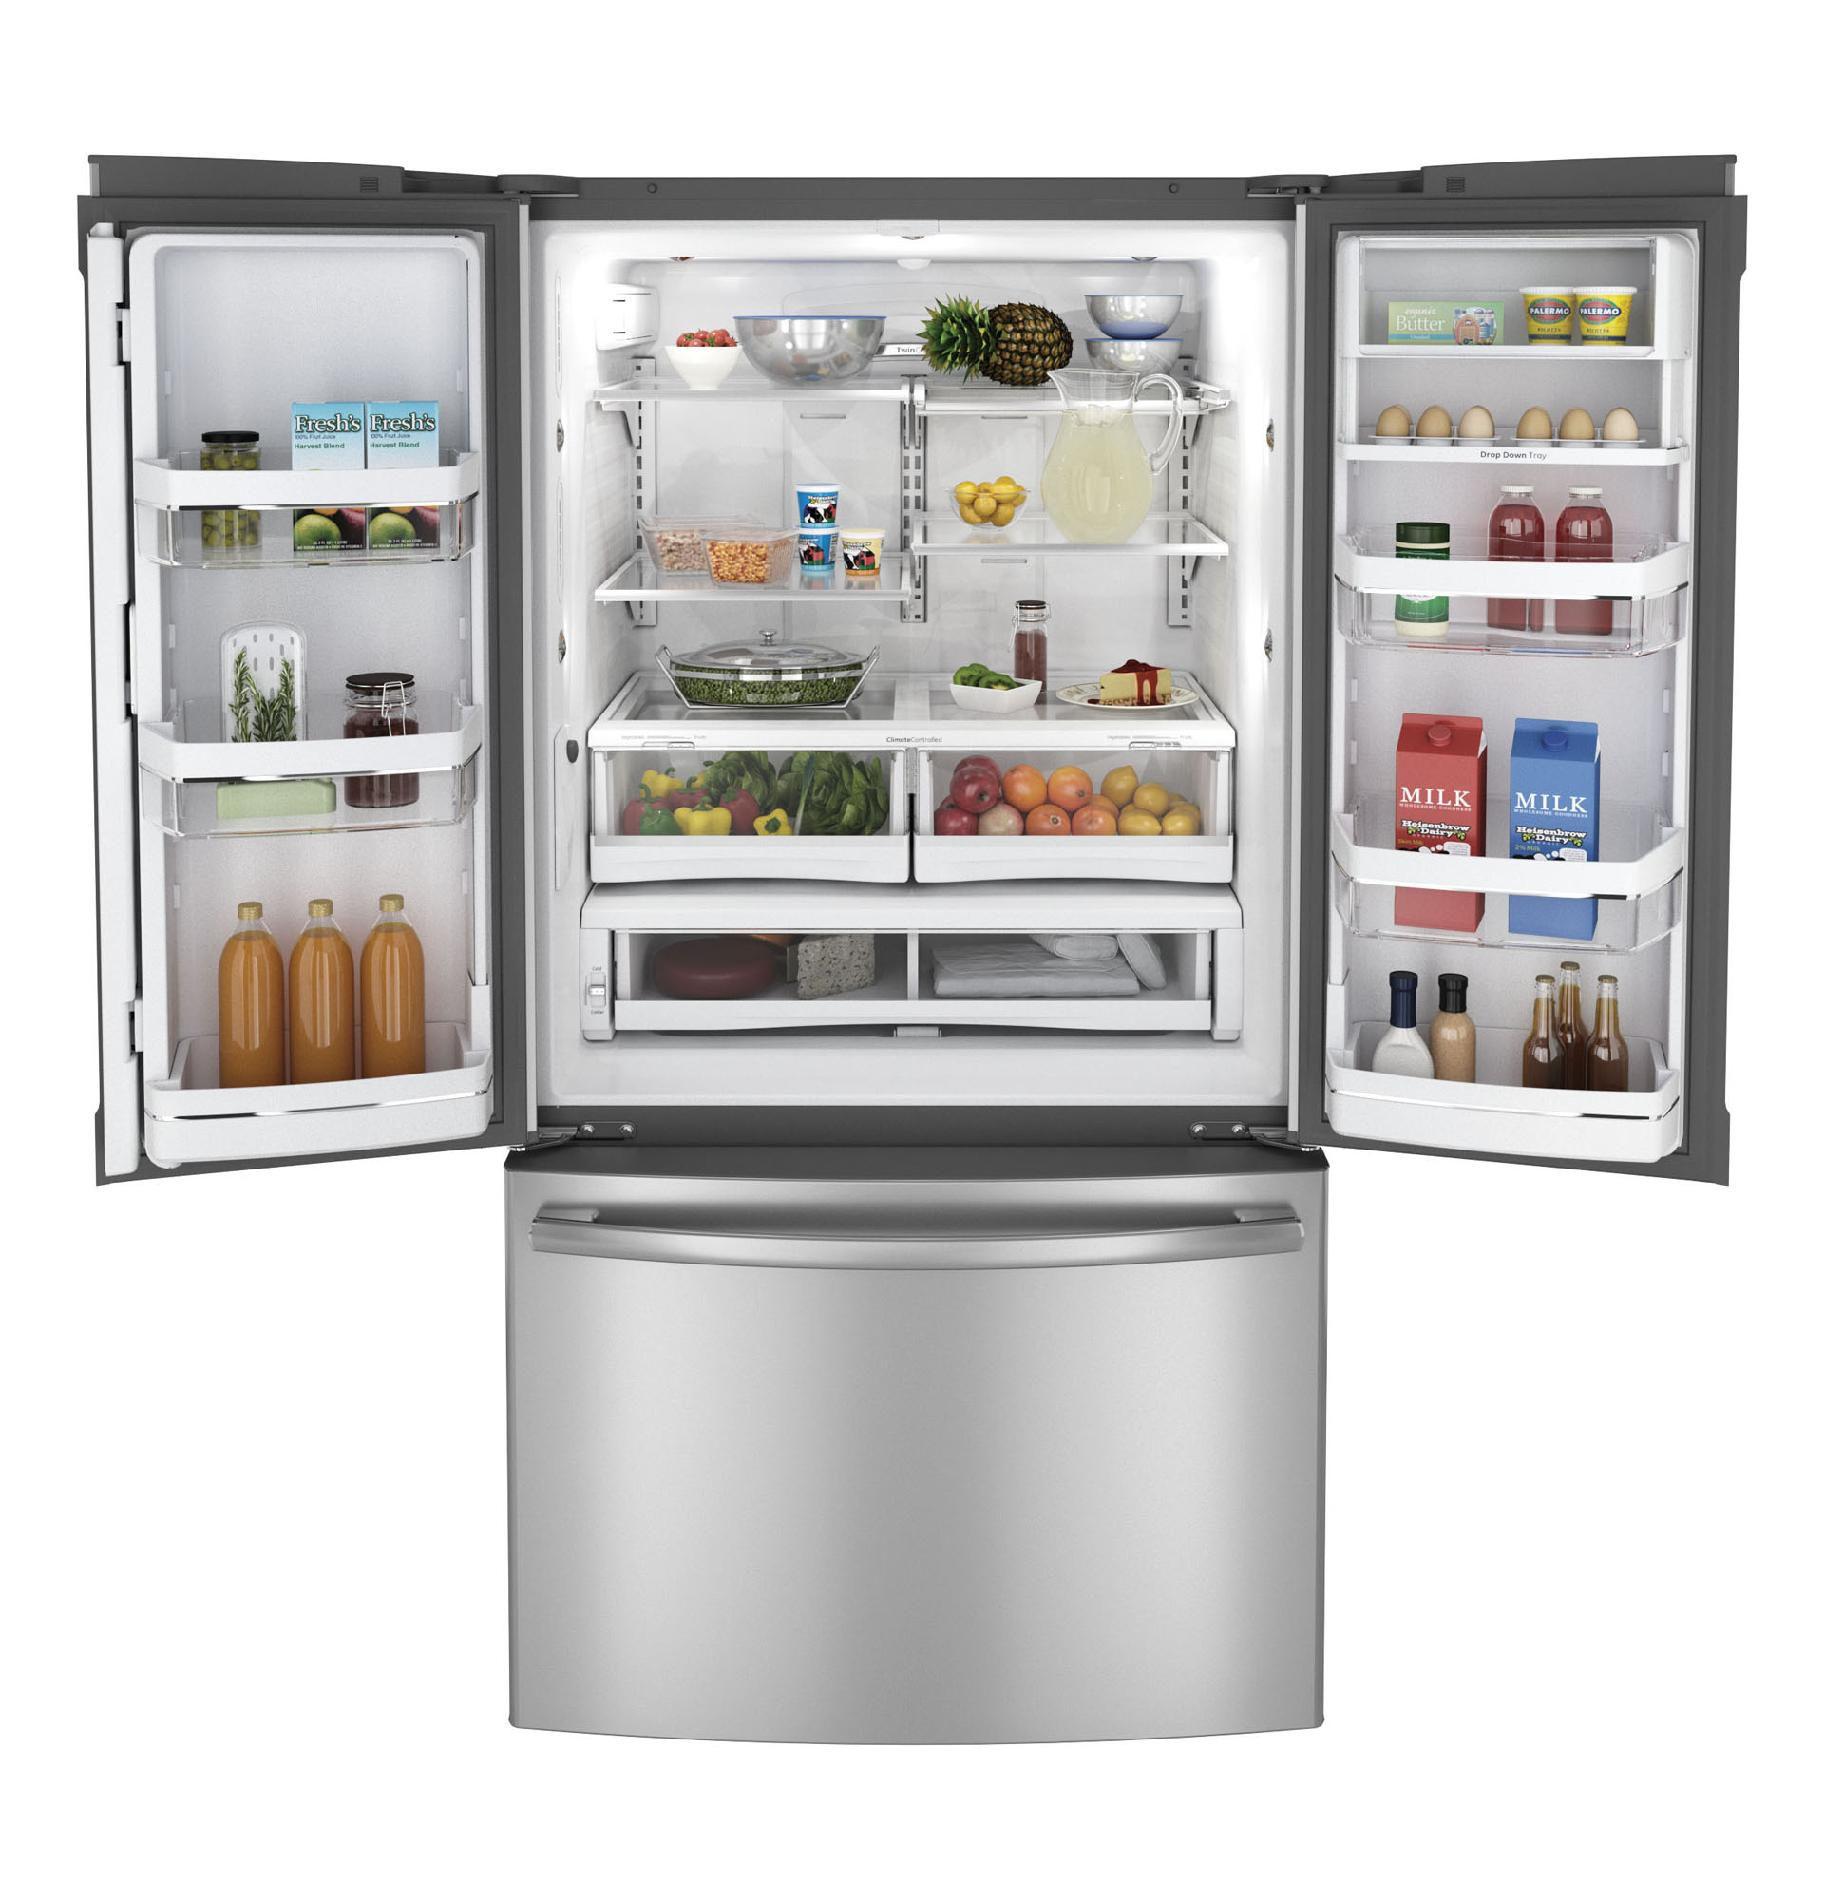 GE Profile PWE23KSDSS 22.7 cu. ft. Counter-Depth French Door Refrigerator - Stainless Steel